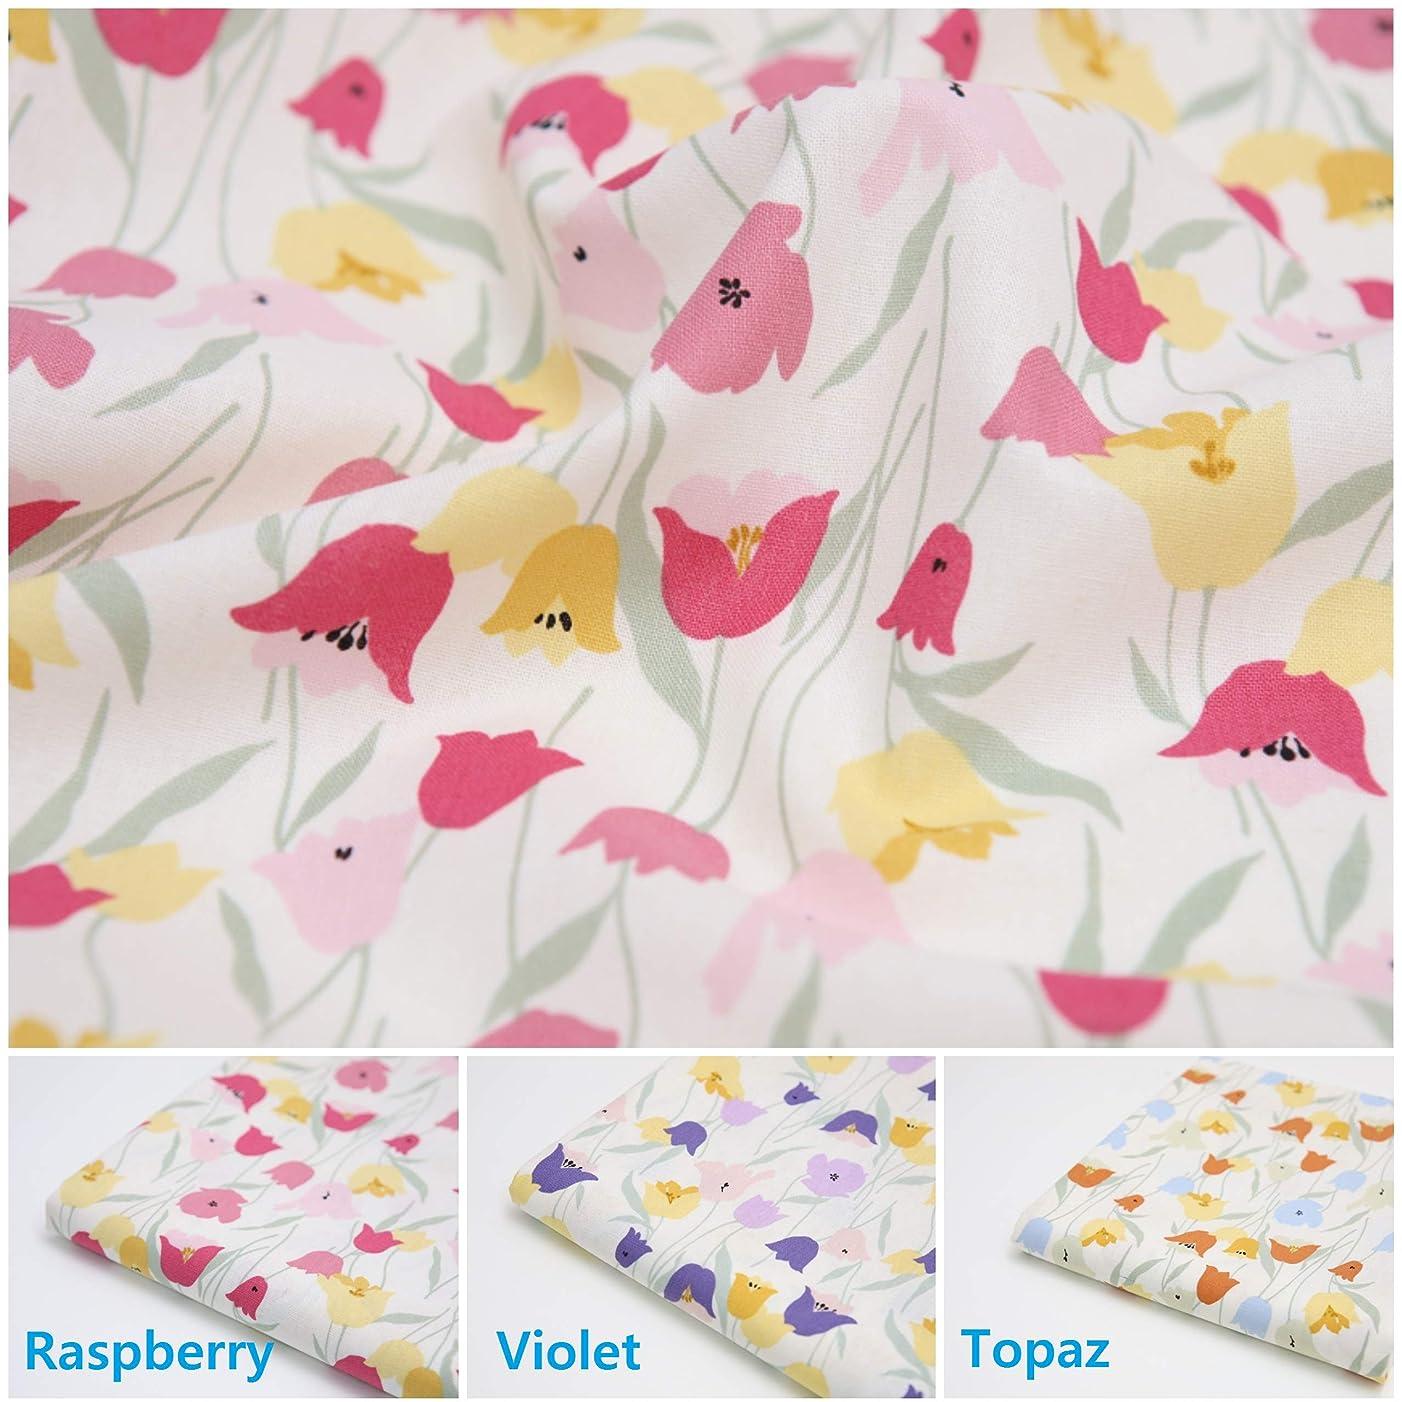 COTTONVILL Linen Blend Flowers Quilting Fabric 2yd, Tulip (Raspberry)